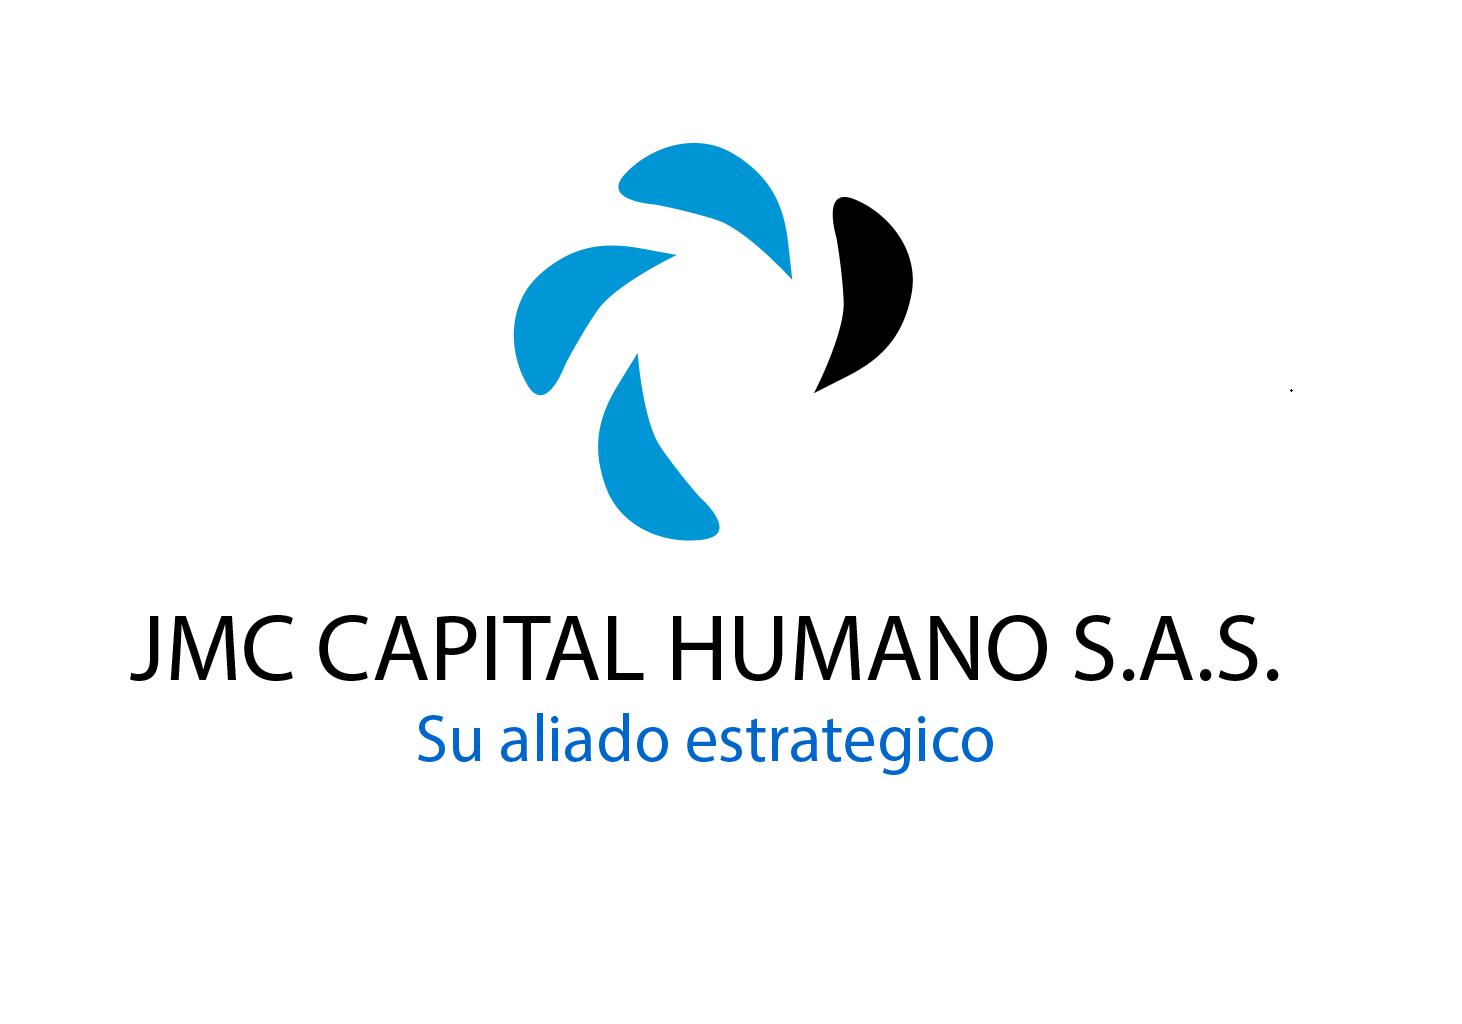 JMC Capital Humano S.A.S